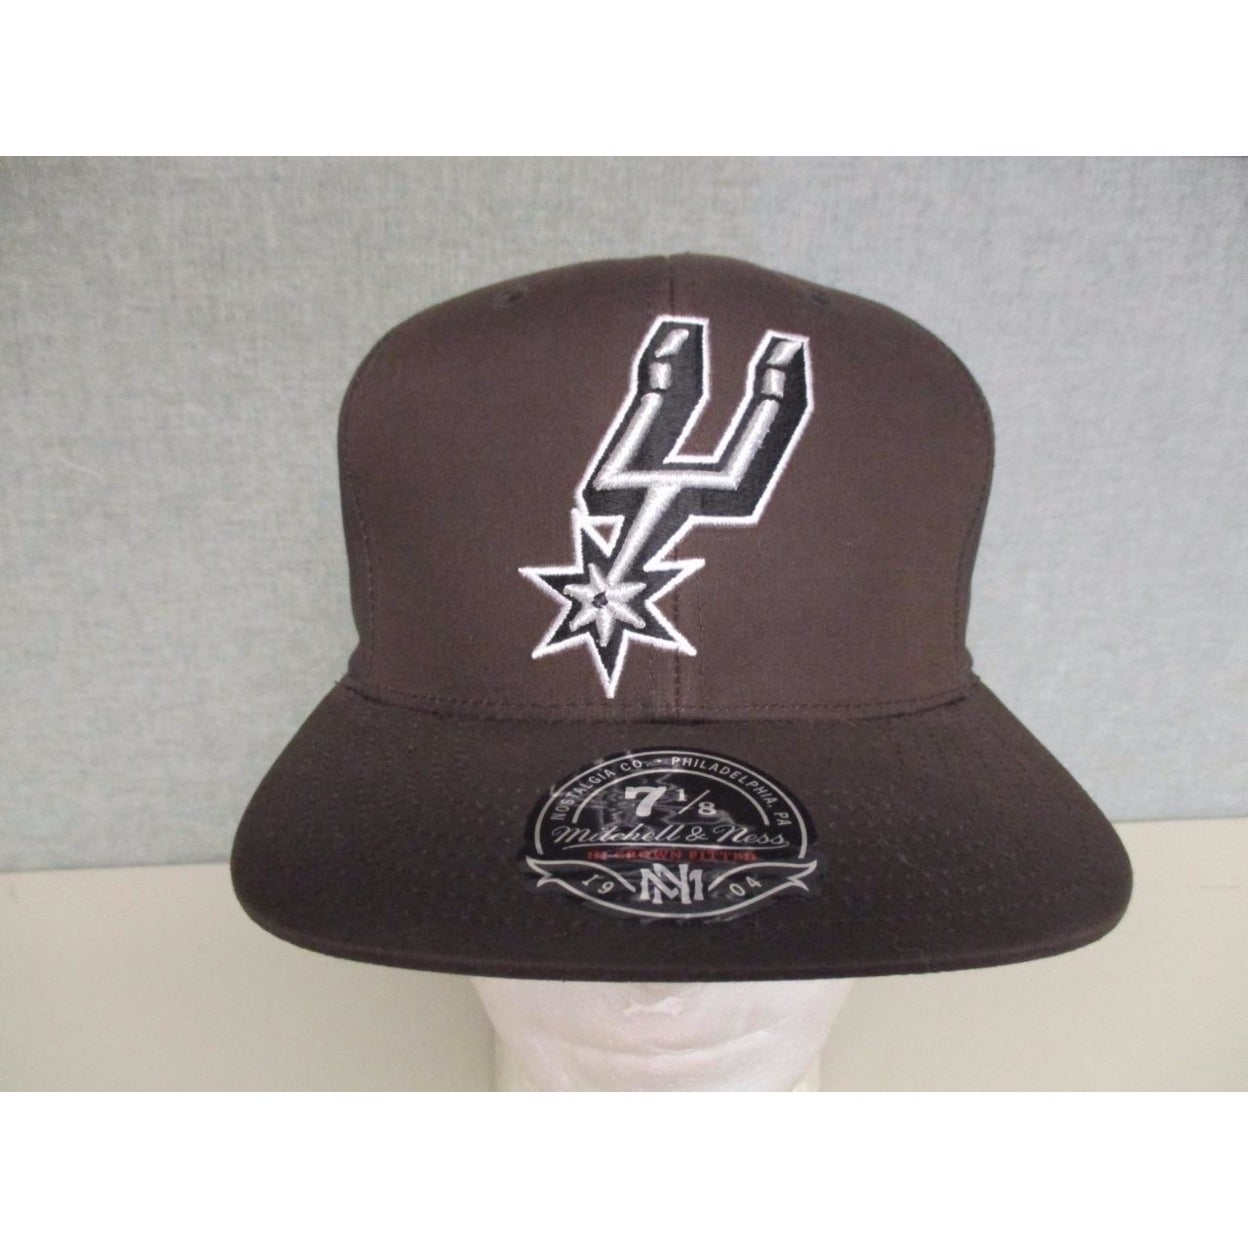 San Antonio Spurs Mens Mitchell & Ness Size 7 1/8 Flatbrim Brown/Camo Hat $32